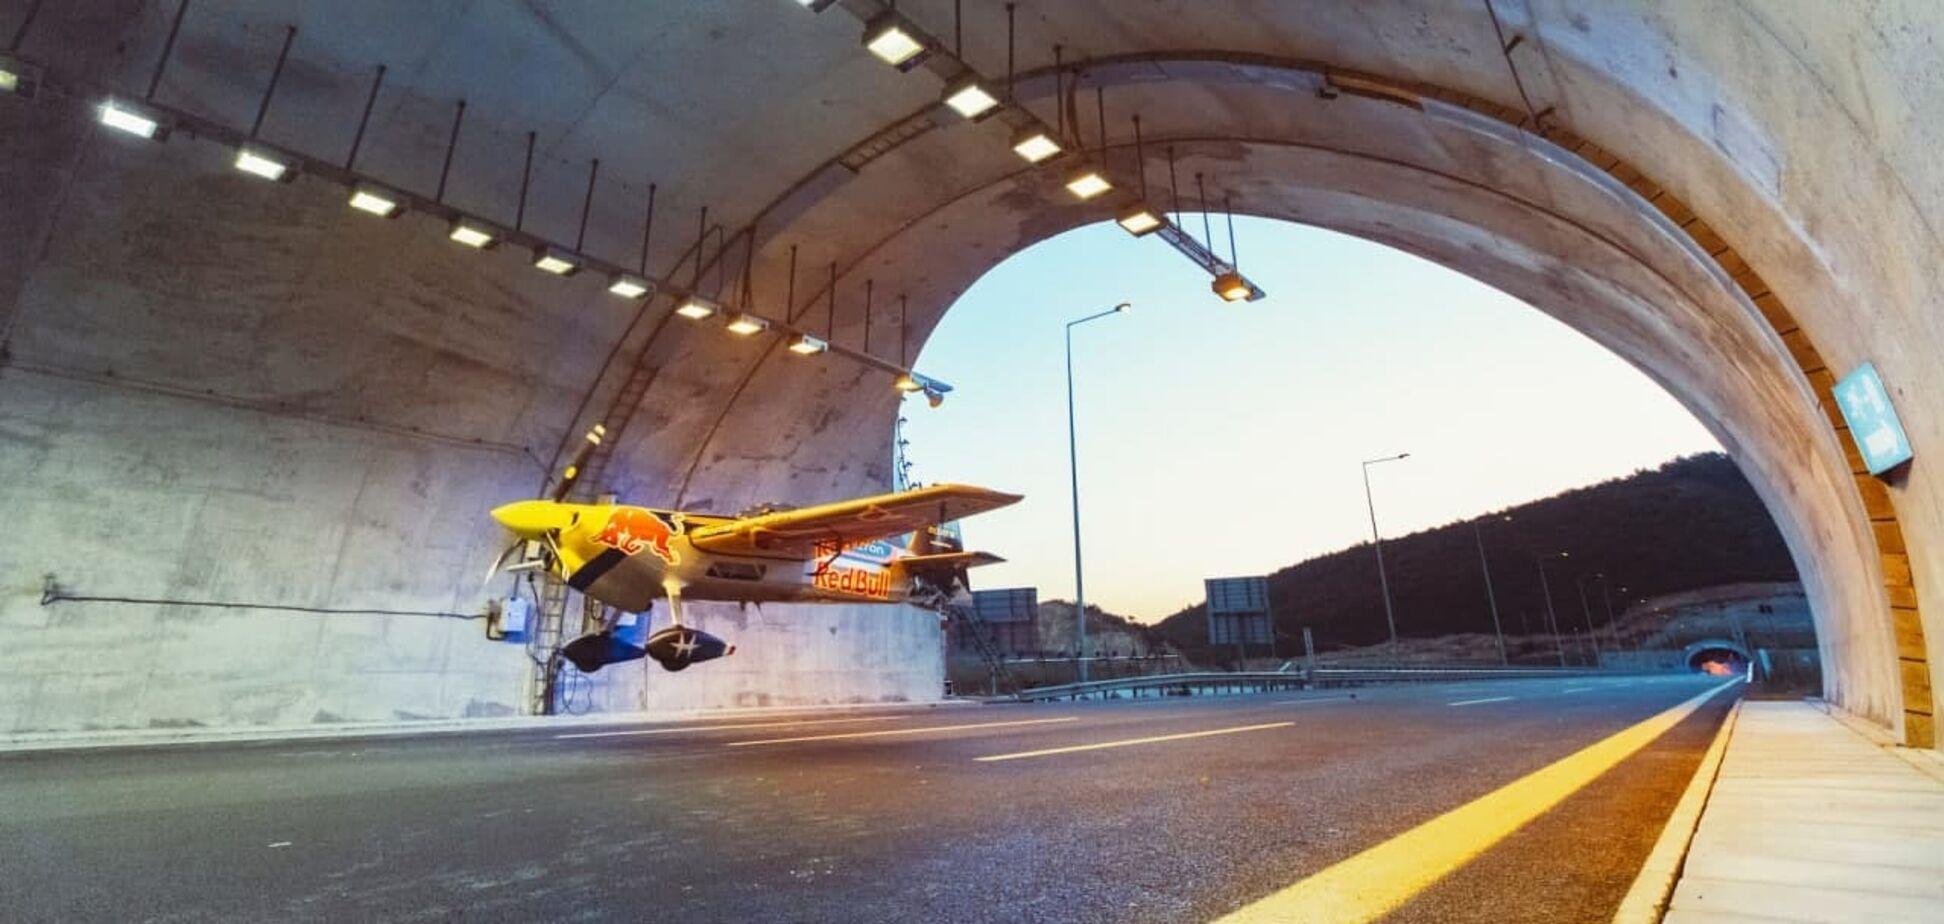 Рекордный полет Red Bull атлета Дарио Коста в тоннеле